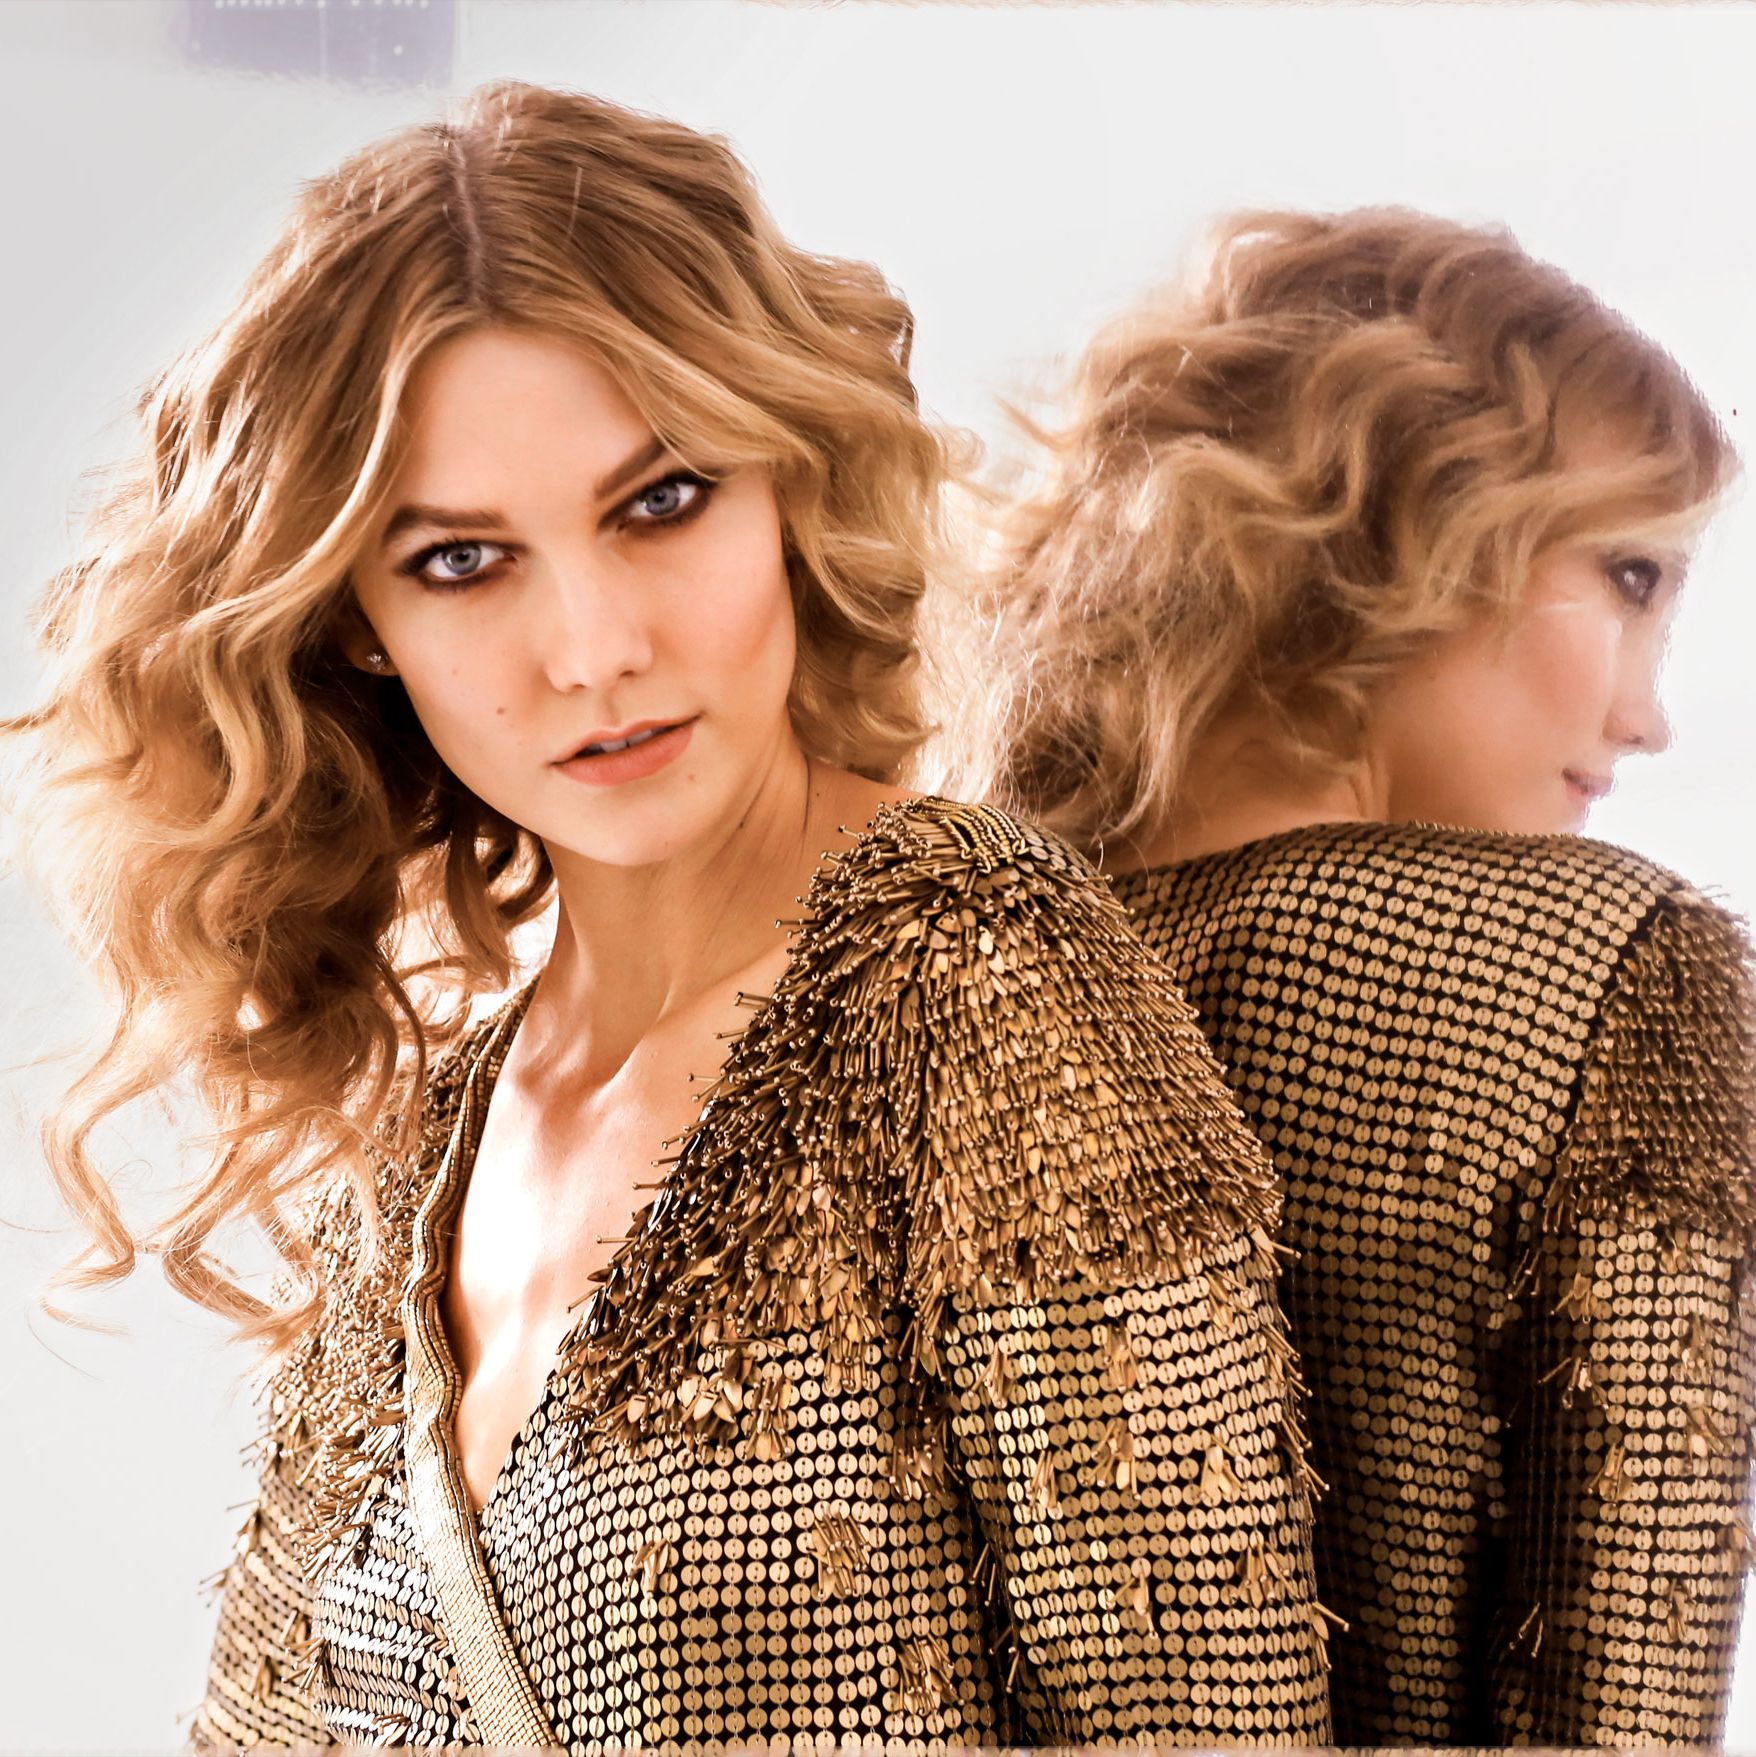 "<p>To get the look, use a 1½- inch-barrel curling iron—like <a href=""http://www.target.com/p/conair-instant-heat-curling-iron-3-4/-/A-10878189?ref=tgt_adv_XS000000&amp&#x3B;AFID=google_pla_df&amp&#x3B;CPNG=PLA_Health+Beauty+Shopping&amp&#x3B;adgroup=SC_Health+Beauty&amp&#x3B;LID=700000001170770pgs&amp&#x3B;network=g&amp&#x3B;device=c&amp&#x3B;location=9032022&amp&#x3B;gclid=CjwKEAiAmdXBBRD0hZCVkYHTl20SJACWsZj9dqGptJA0TNg_srFVEeYNmy4wFBmJGPiWSi4rkxV3IBoCkADw_wcB&amp&#x3B;gclsrc=aw.ds"" target=""_blank"" data-tracking-id=""recirc-text-link"">Conair Instant Heat Curling Iron</a> ($13)—and curl wide sections of your hair. Then break up spirals with a paddle brush, says celebrity hairstylist Nathaniel Hawkins. </p>"